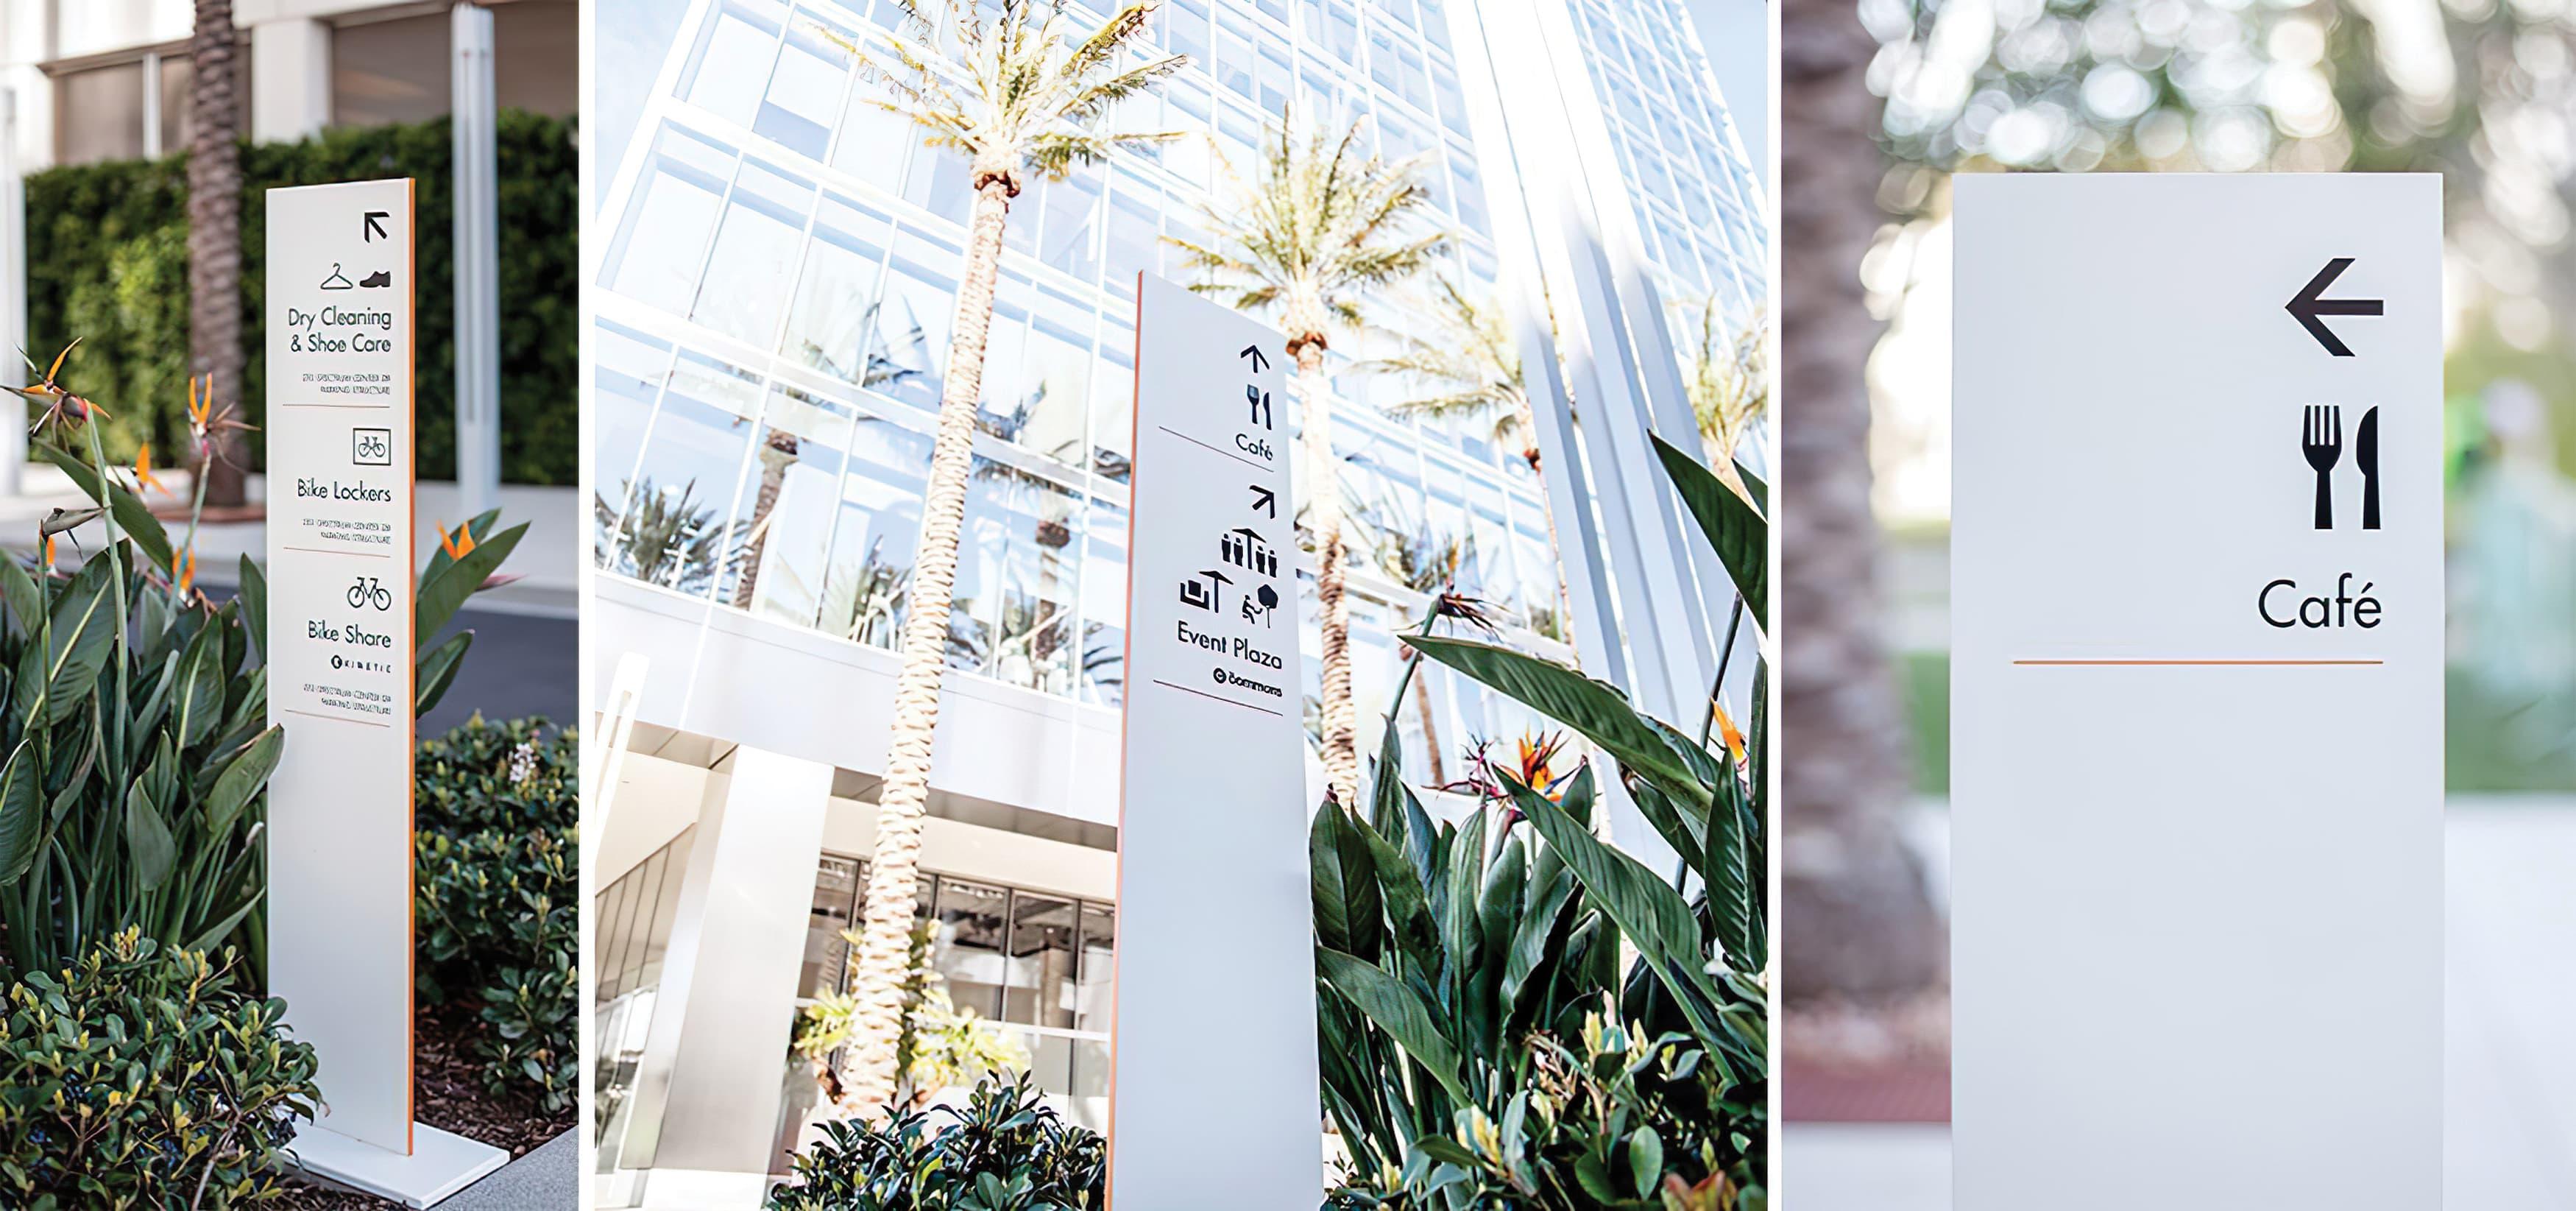 1 Park Plaza, an Irvine Company workplace, Pedestrian wayfinding directional sign.